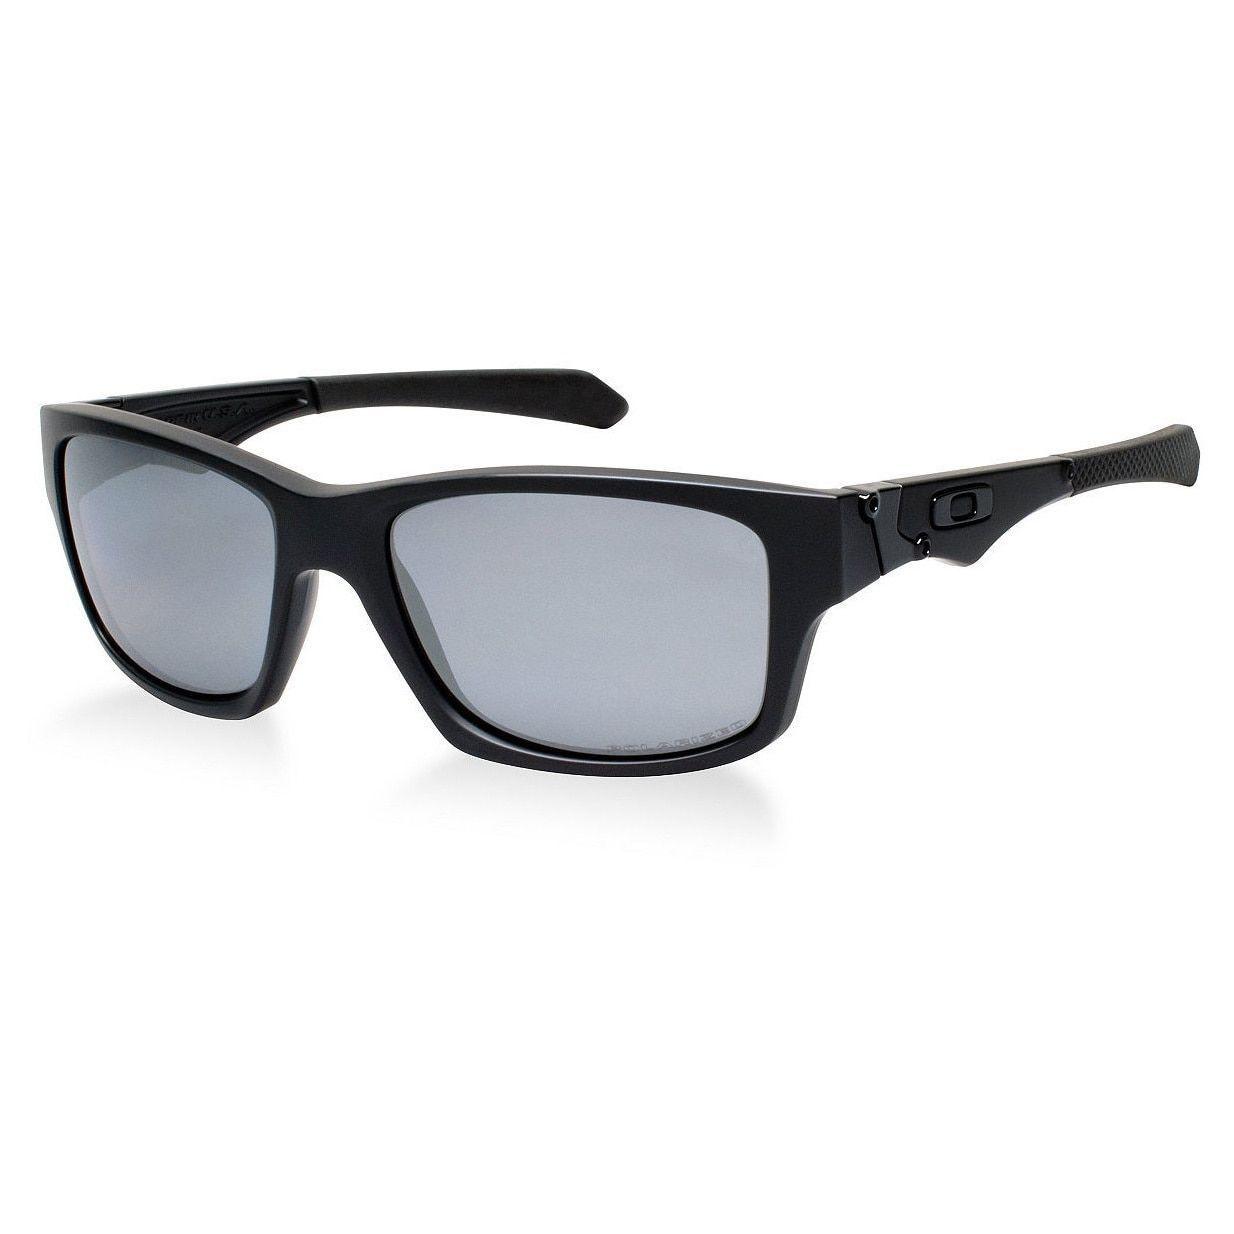 Oakley Men's Jupiter Matte and Iridium Polarized Lens Square Sunglasses